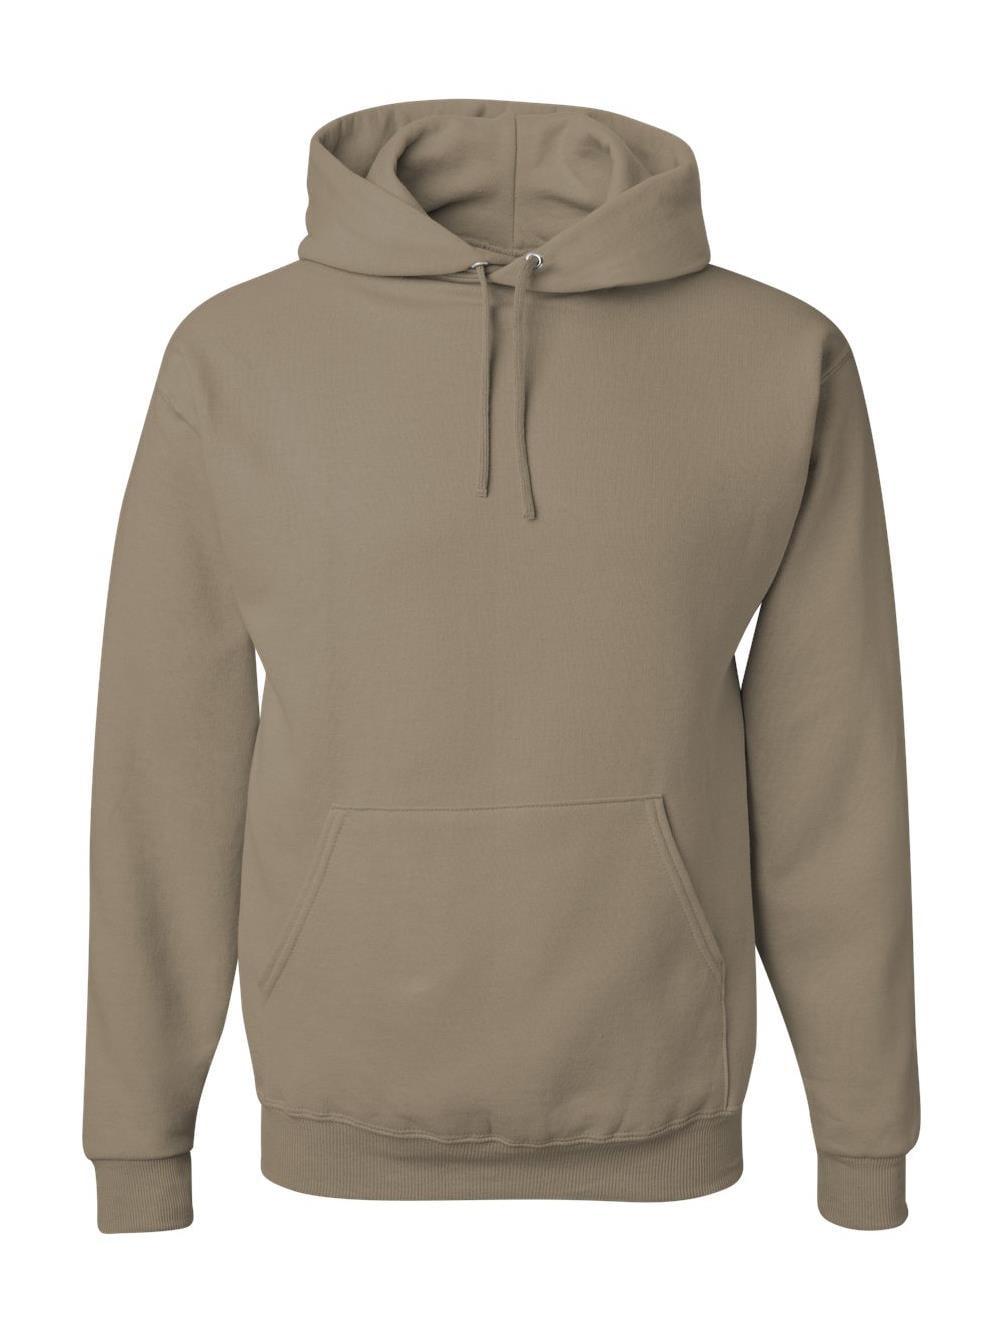 Jerzees Mens NuBlend Pull Over Hooded Sweatshirt, 5X, Light Blue